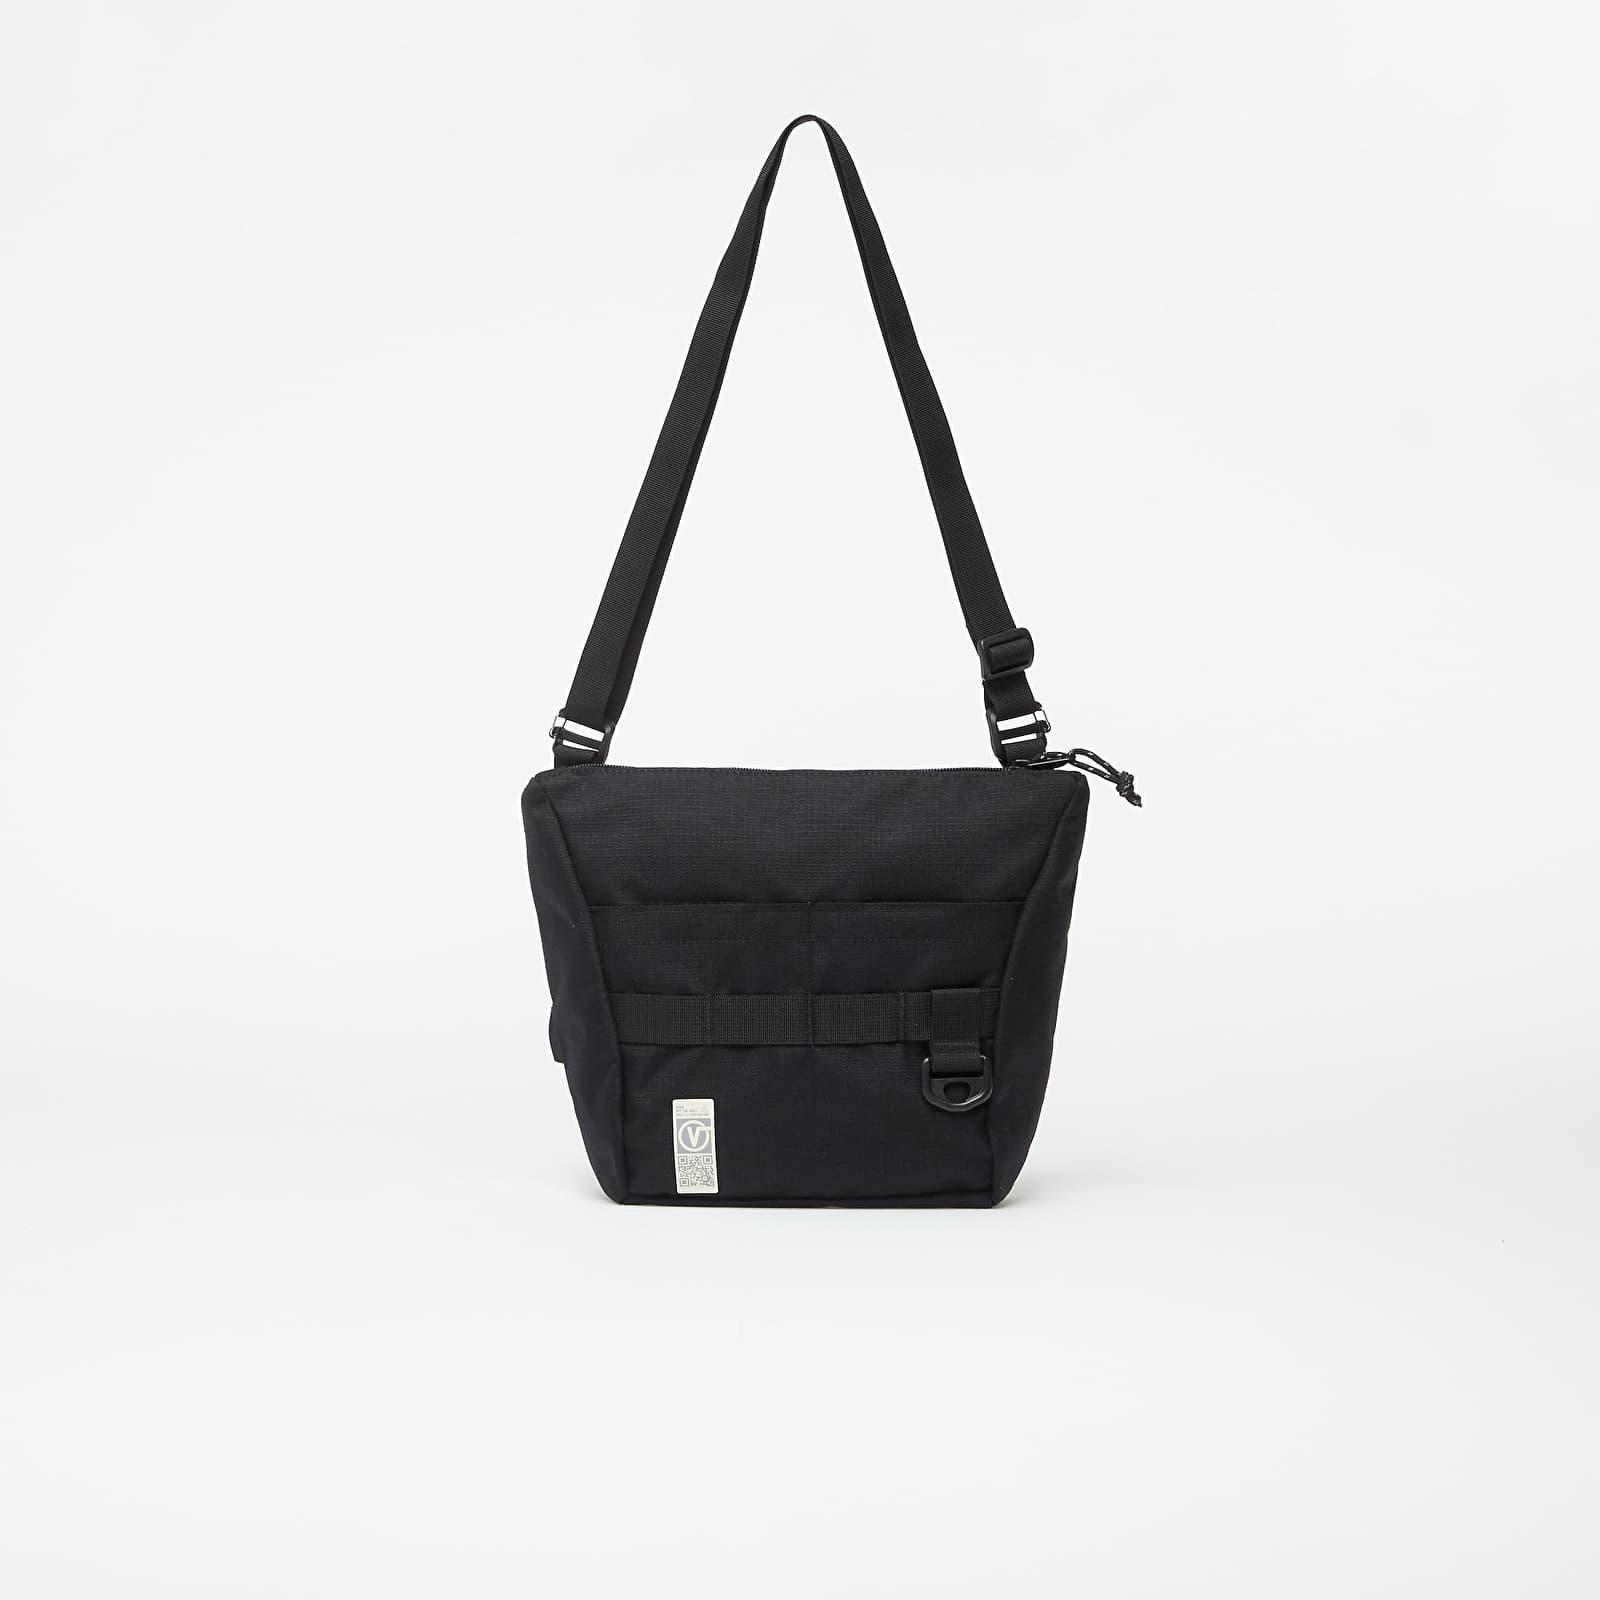 Tašky přes rameno Vans Quick Response Shoulder Bag Black Ripstop